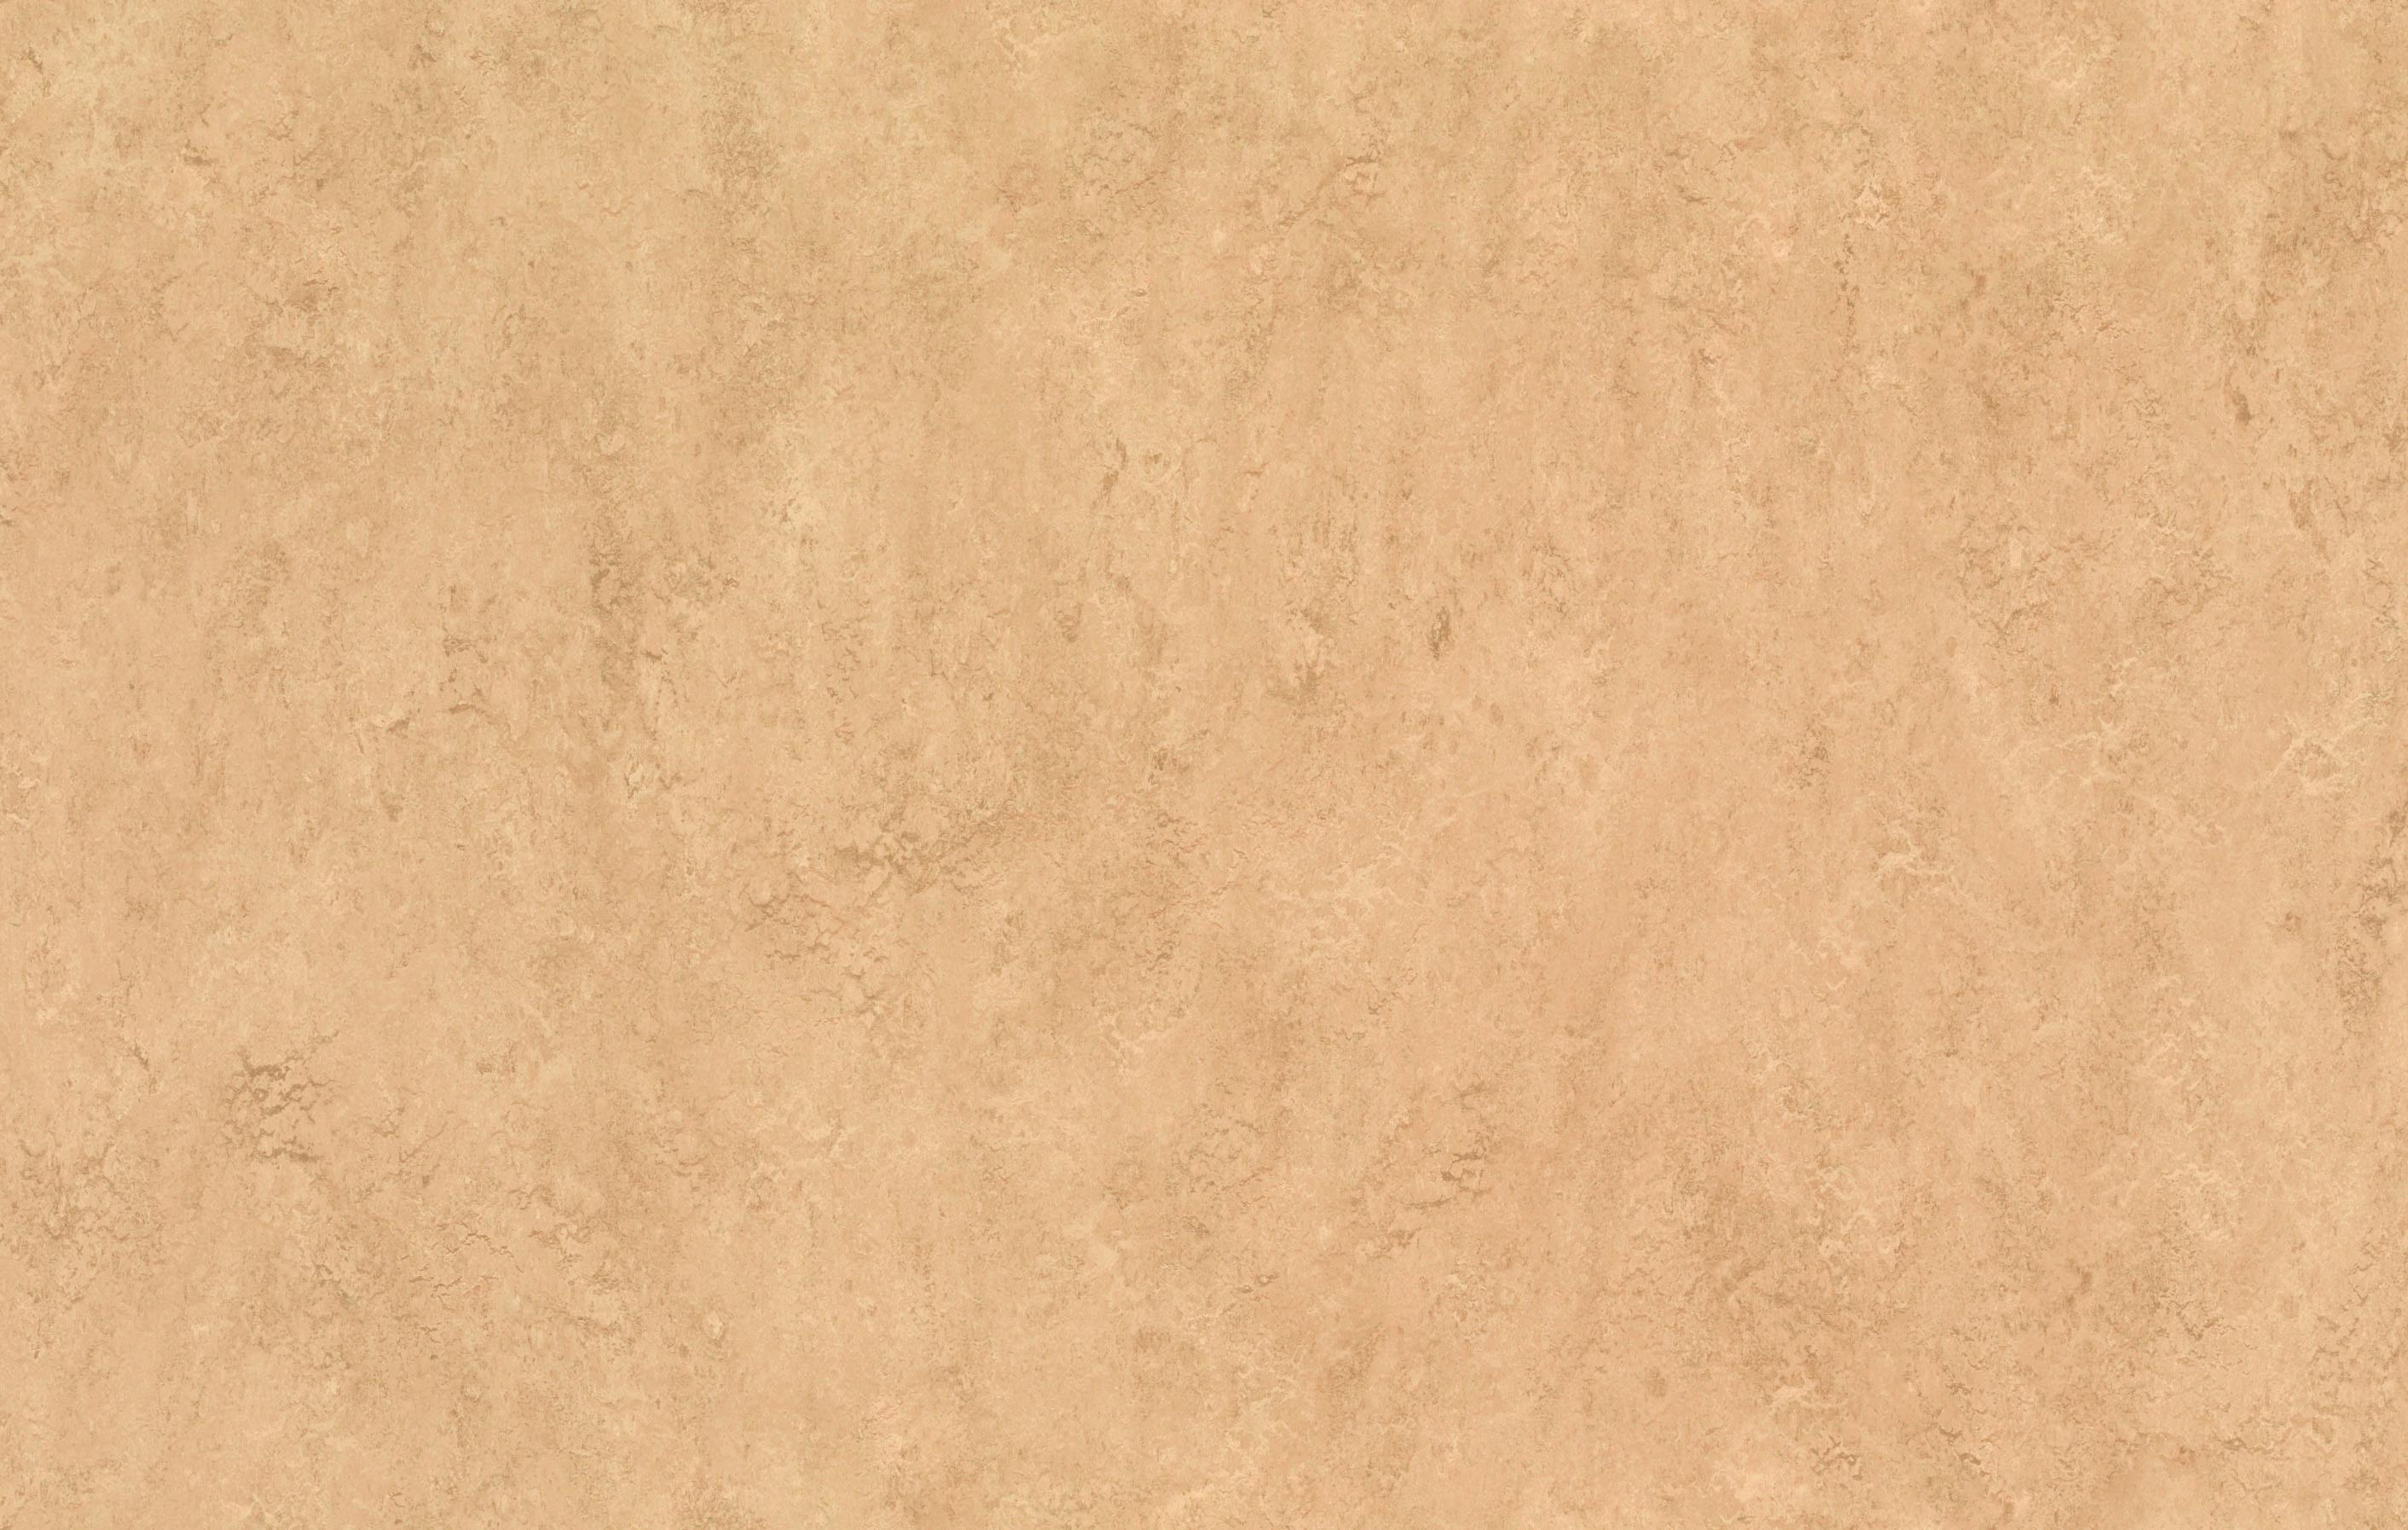 Marmoleum decibel acoustic flooring forbo flooring systems for Marmoleum flooring